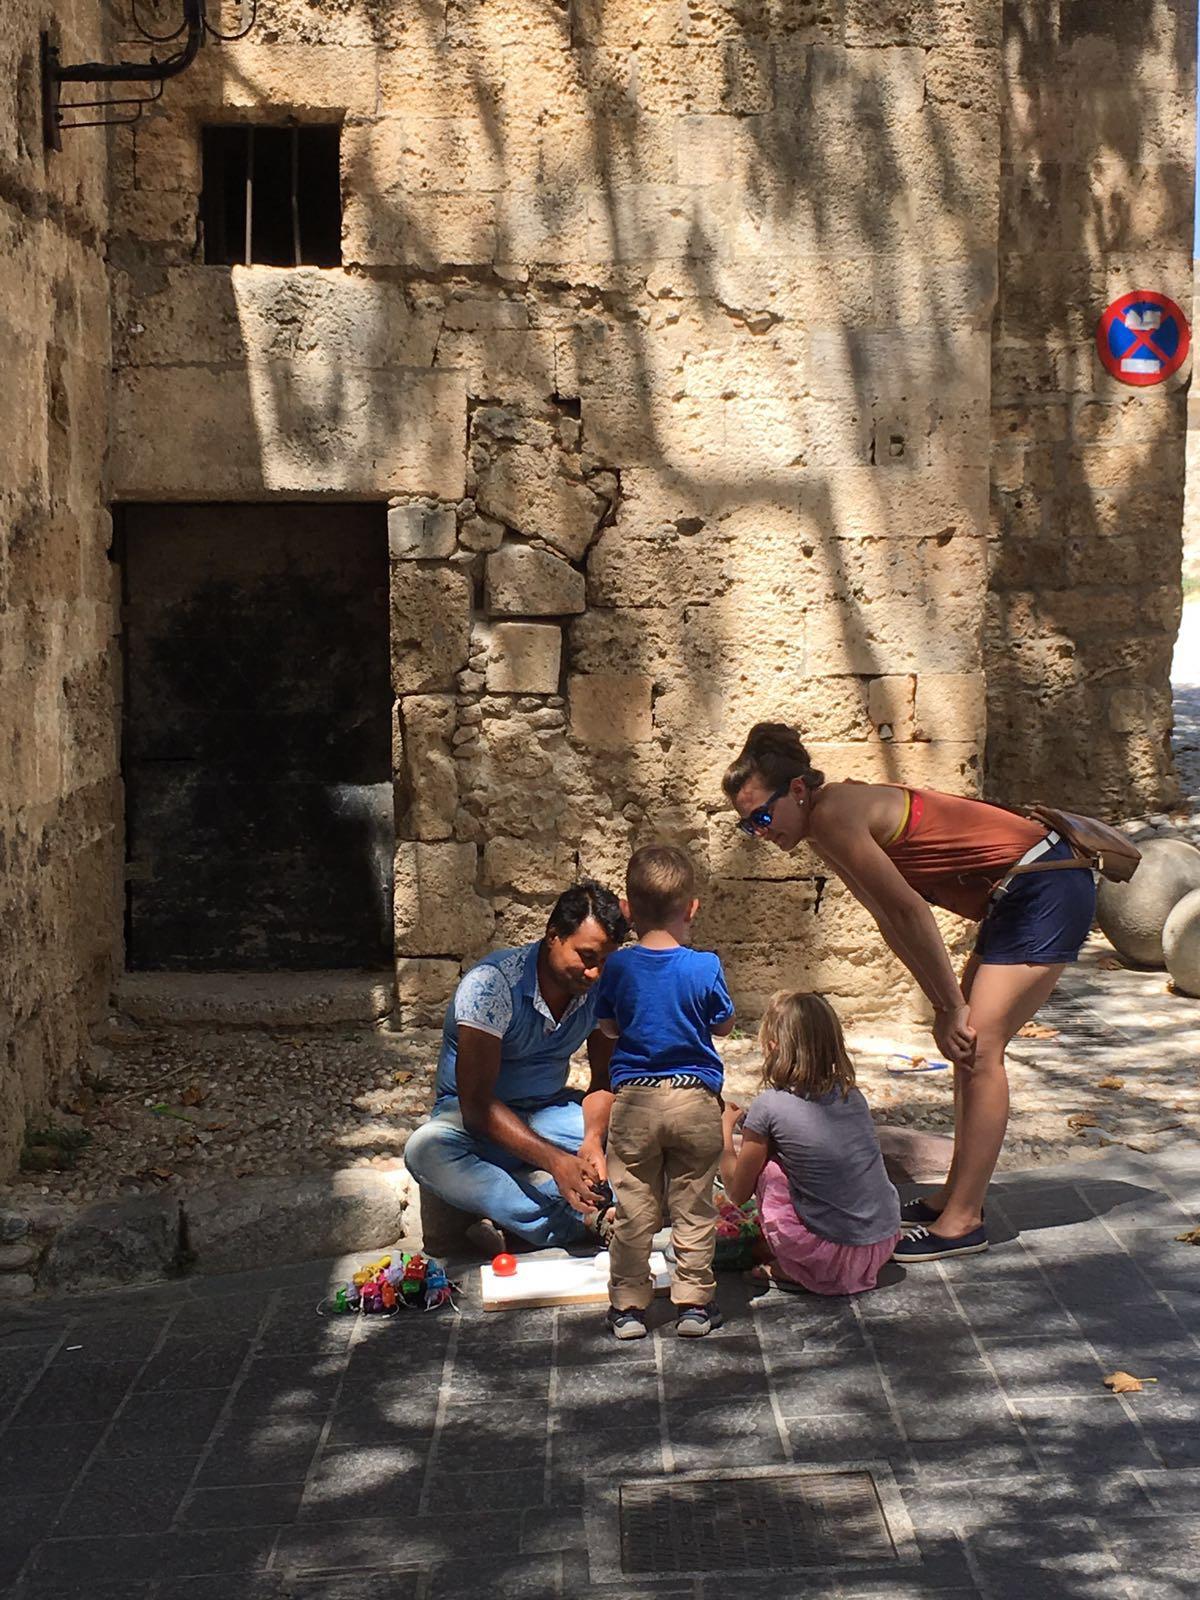 Jenny + The kids bartering in Greece